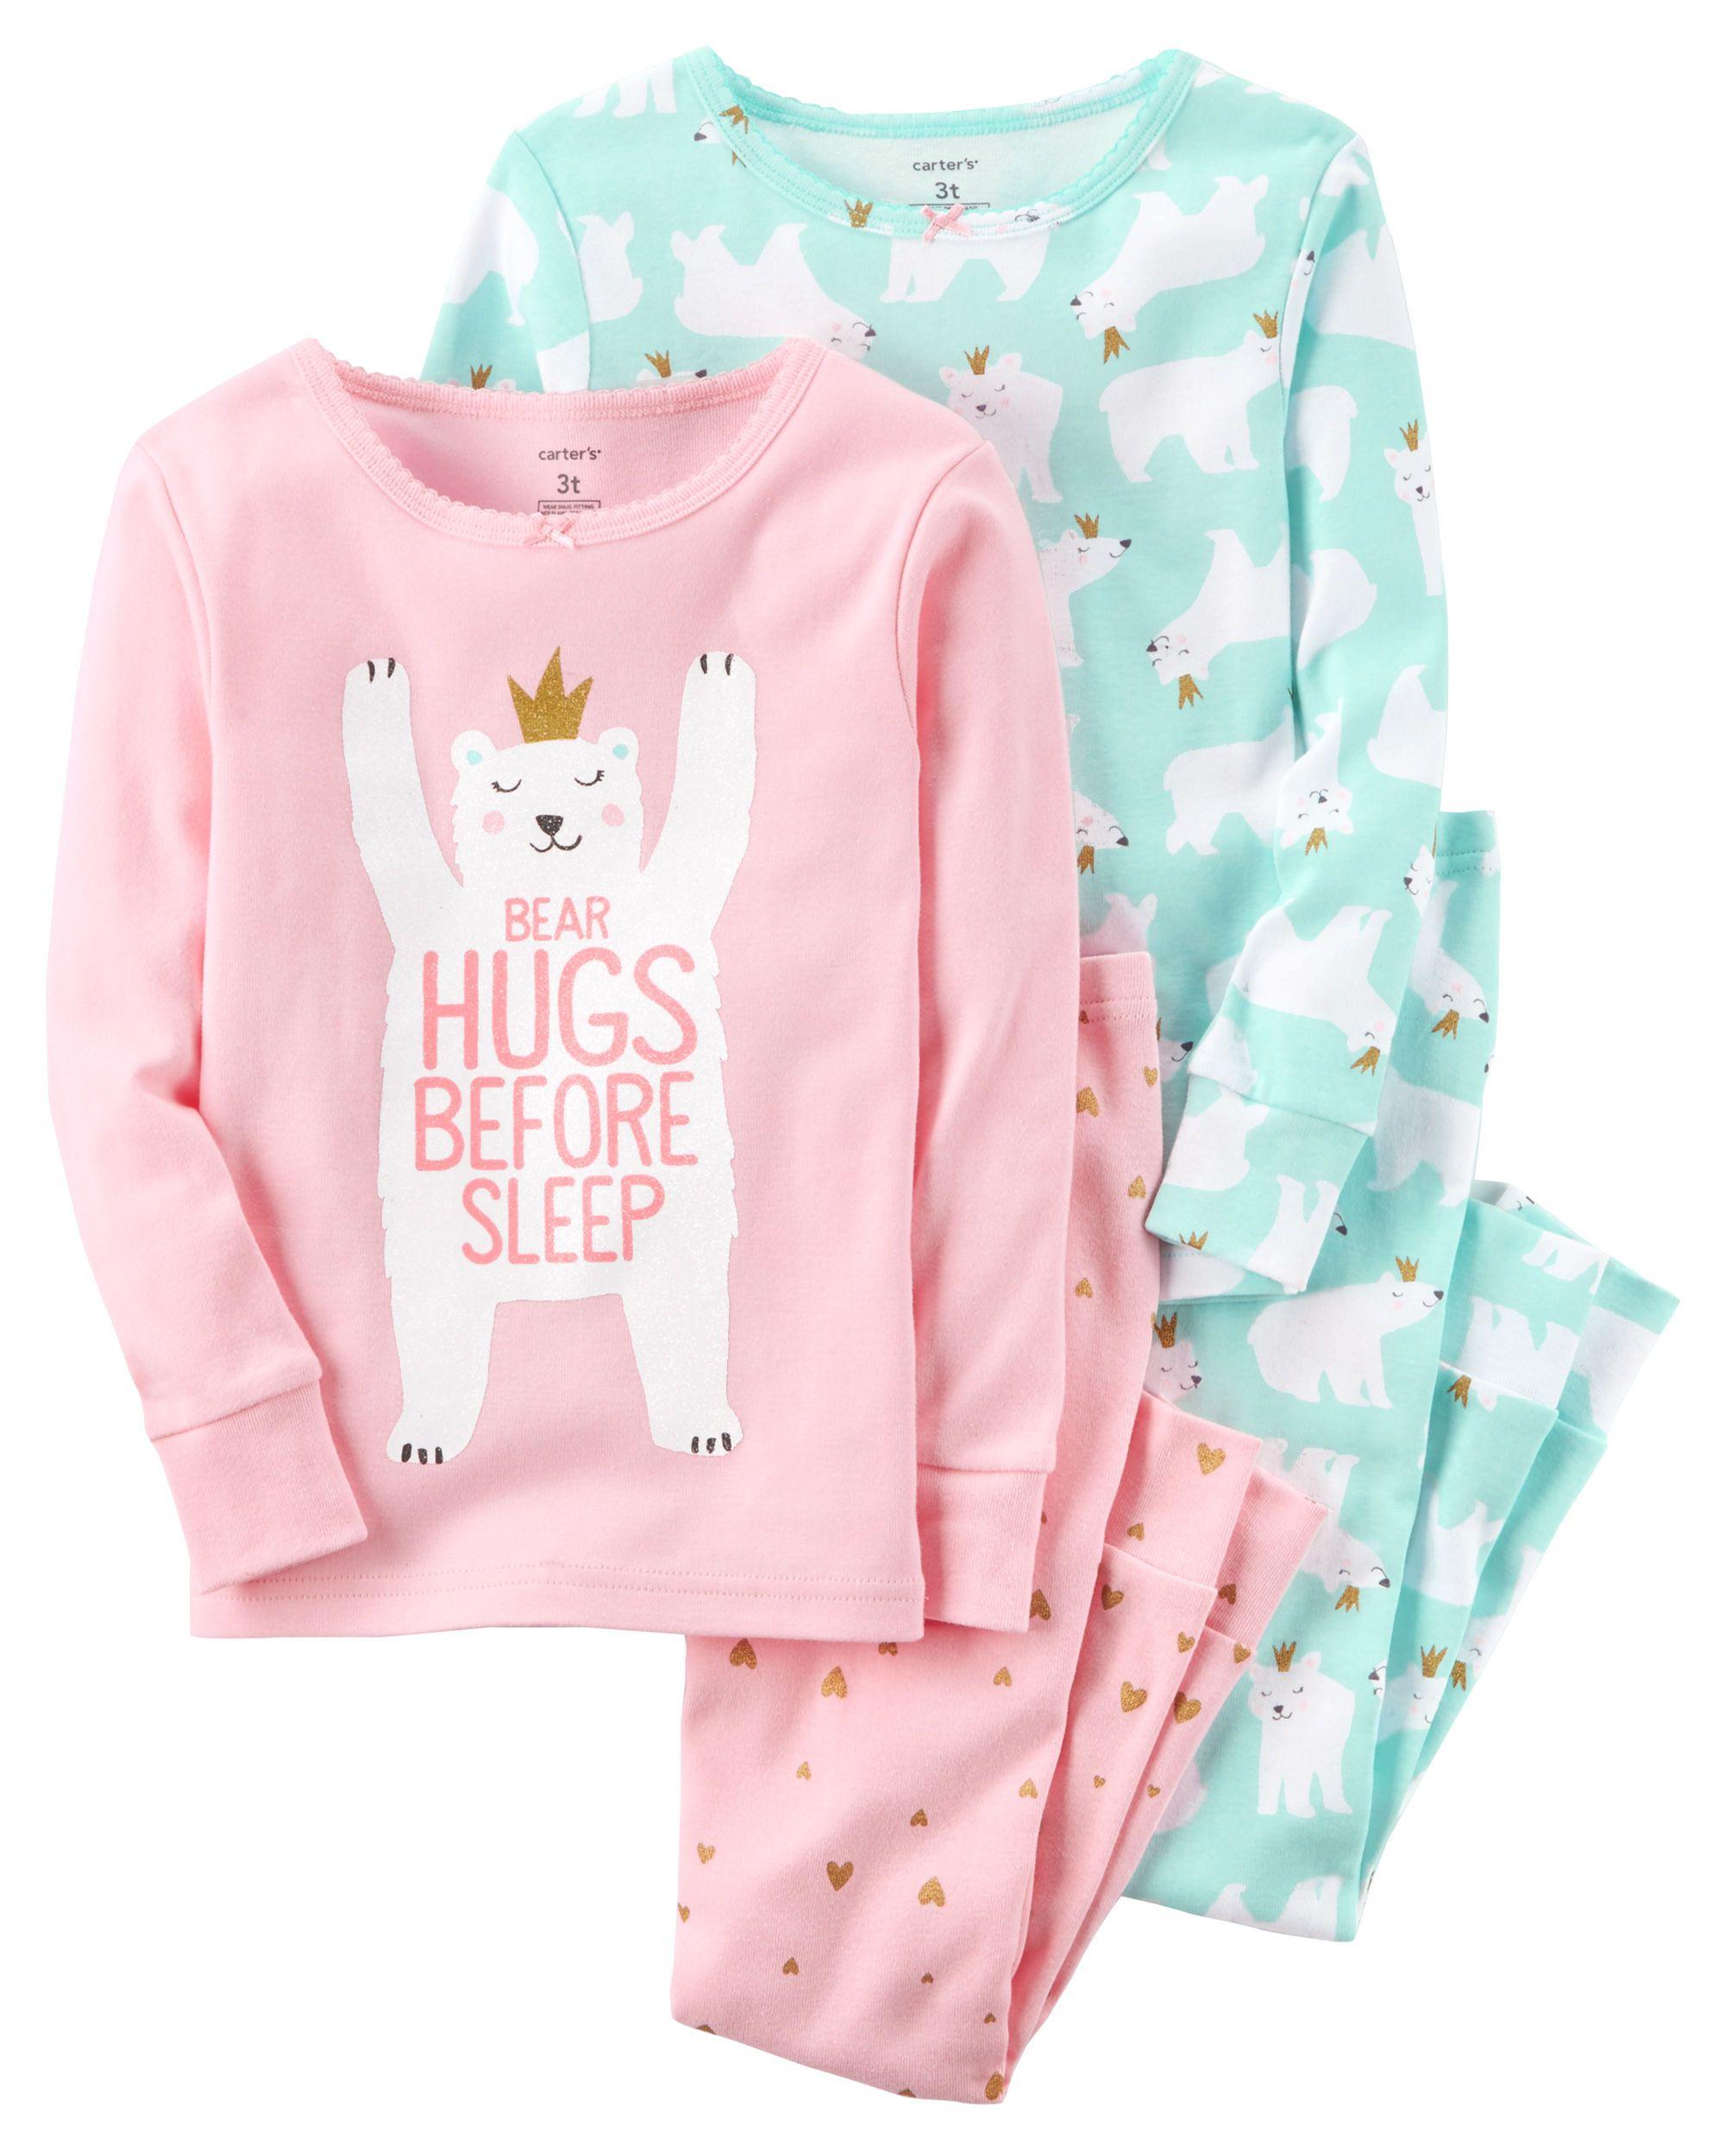 ca0af7c56 4-Piece Polar Bear Snug Fit Cotton PJs